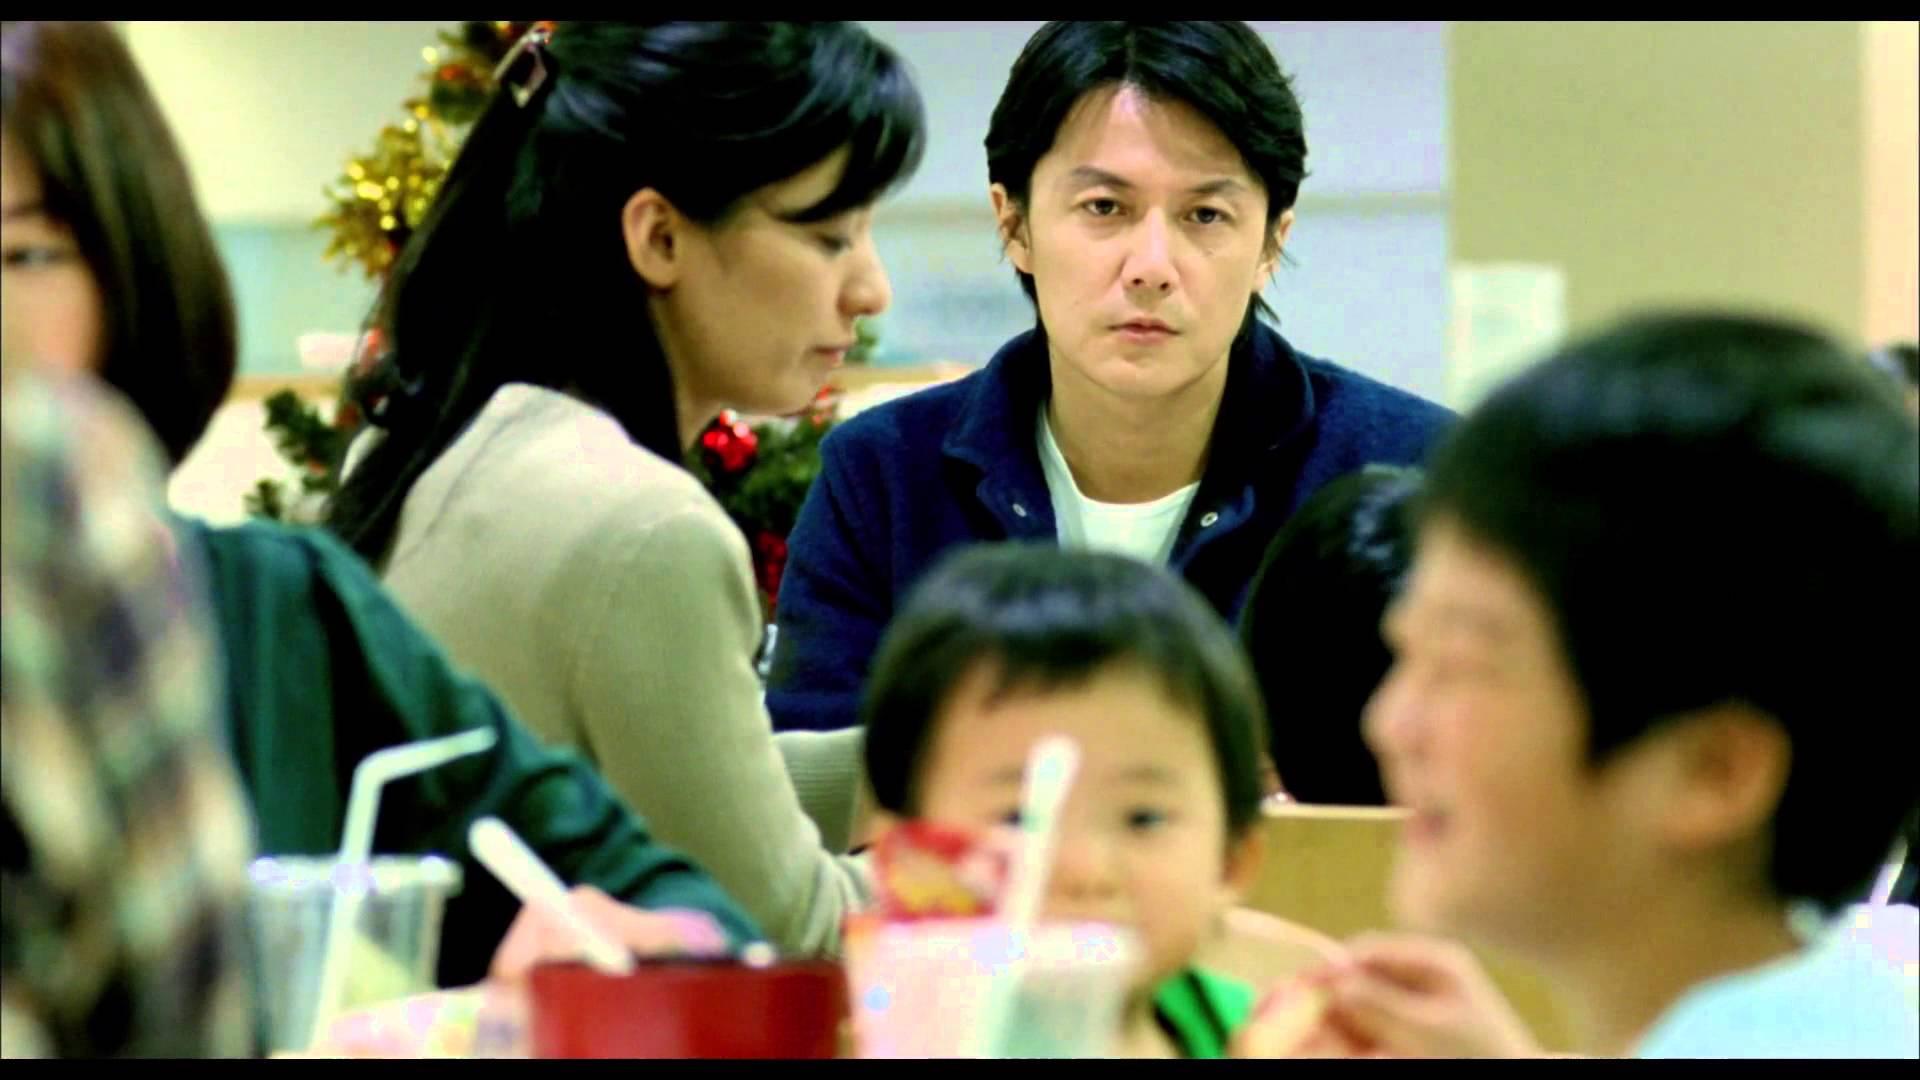 [Movie Review] Like Father, Like Son (そして父になる Soshite Chichi ni Naru)